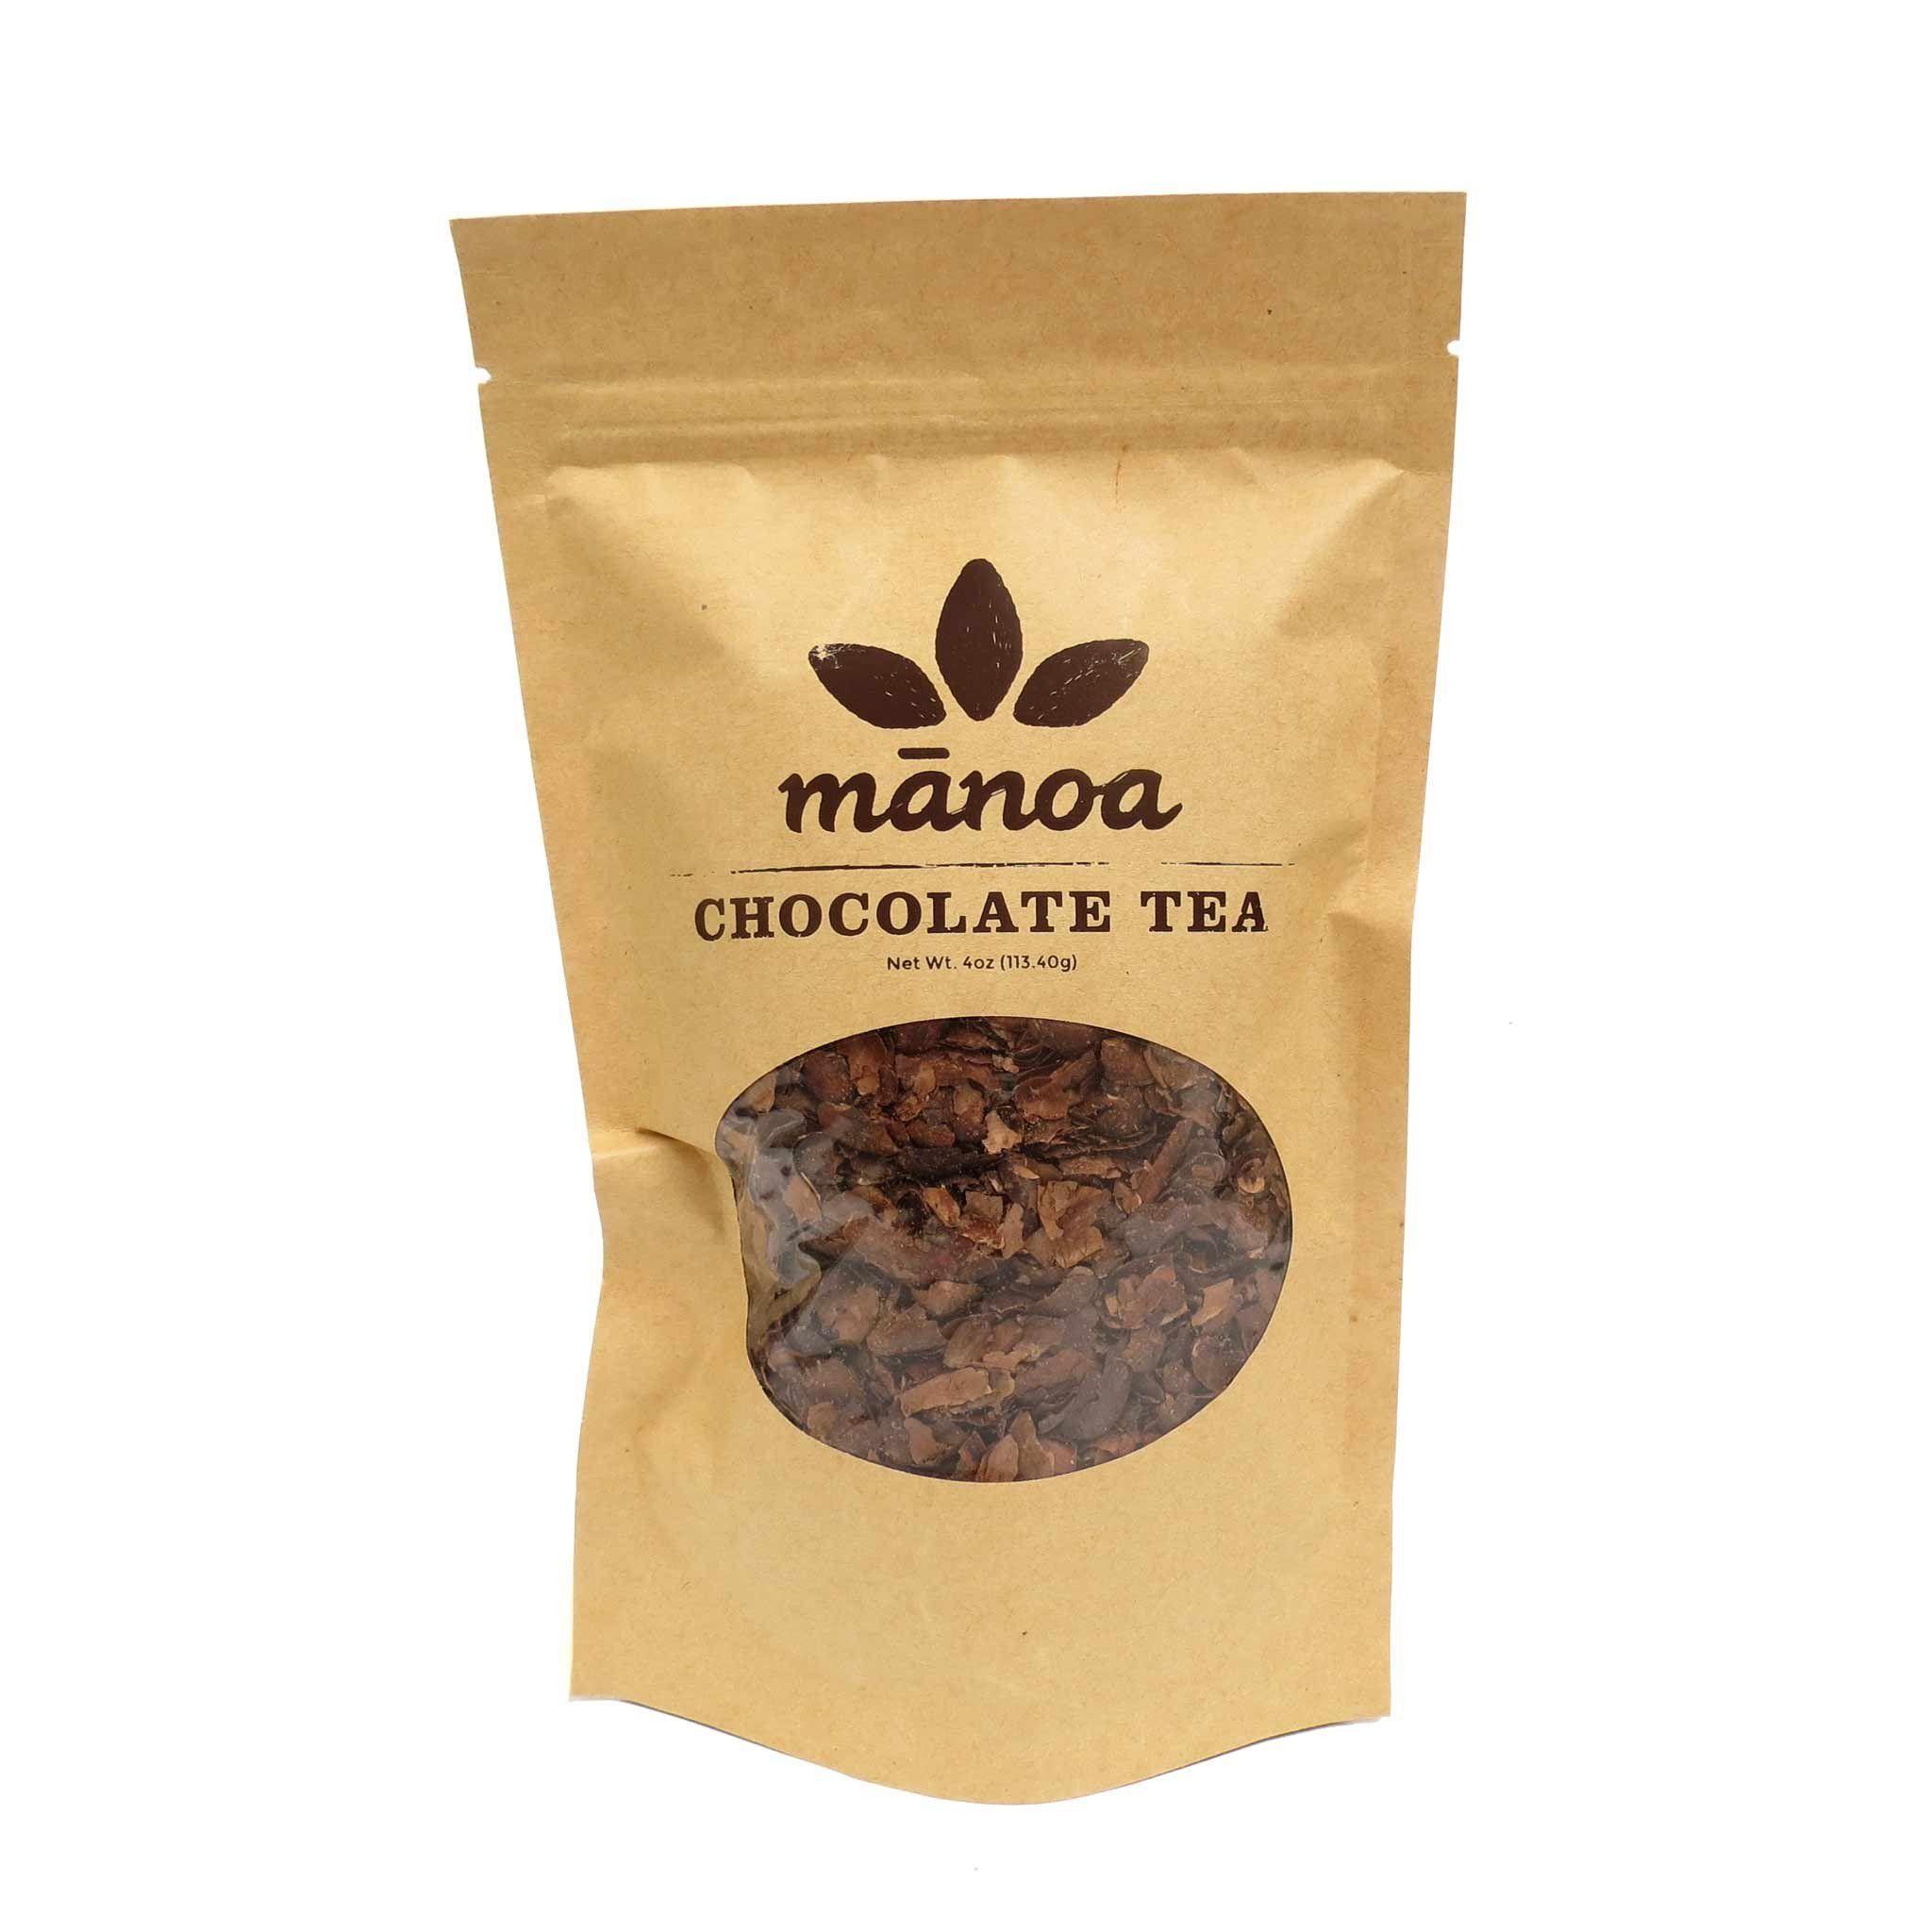 Manoa Chocolate Tea Hawaii | d r i n k - y o s e l f ...